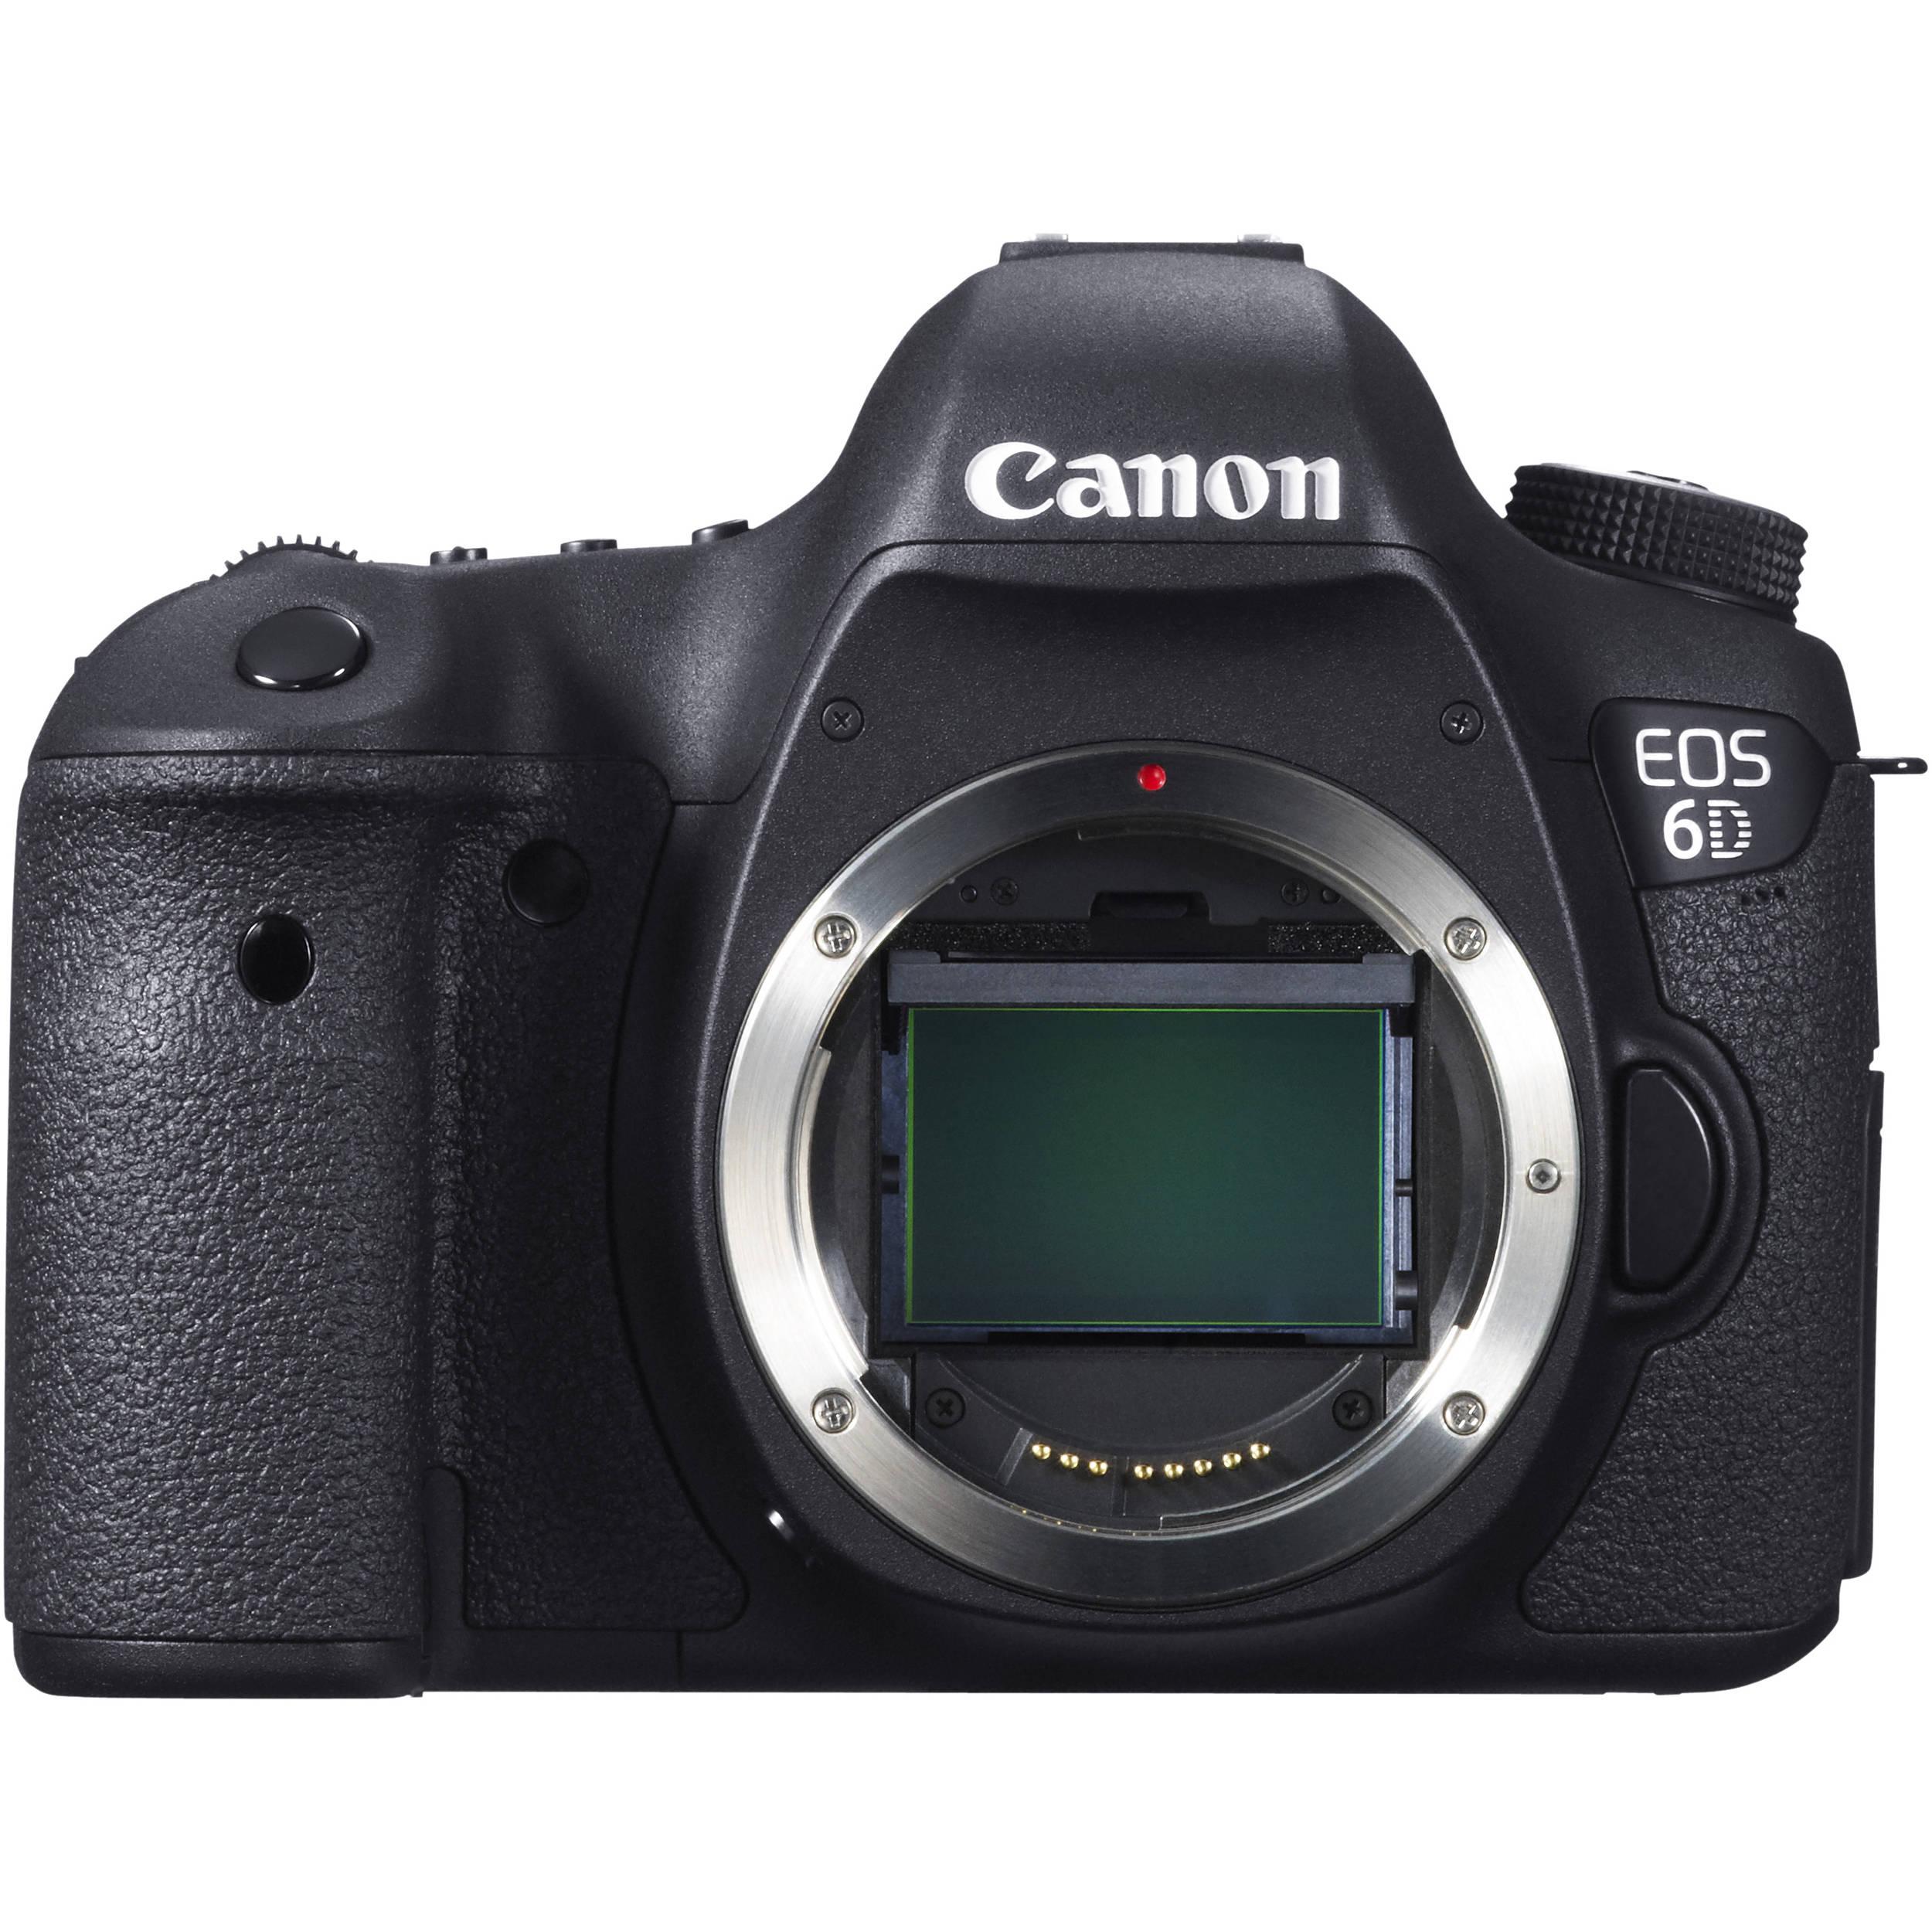 Groovy Canon Eos Dslr Camera Full Frame Camera Body Photo Video Canon Full Frame Cameras Price Pakistan Canon Full Frame Cameras Vs Crop dpreview Canon Full Frame Cameras